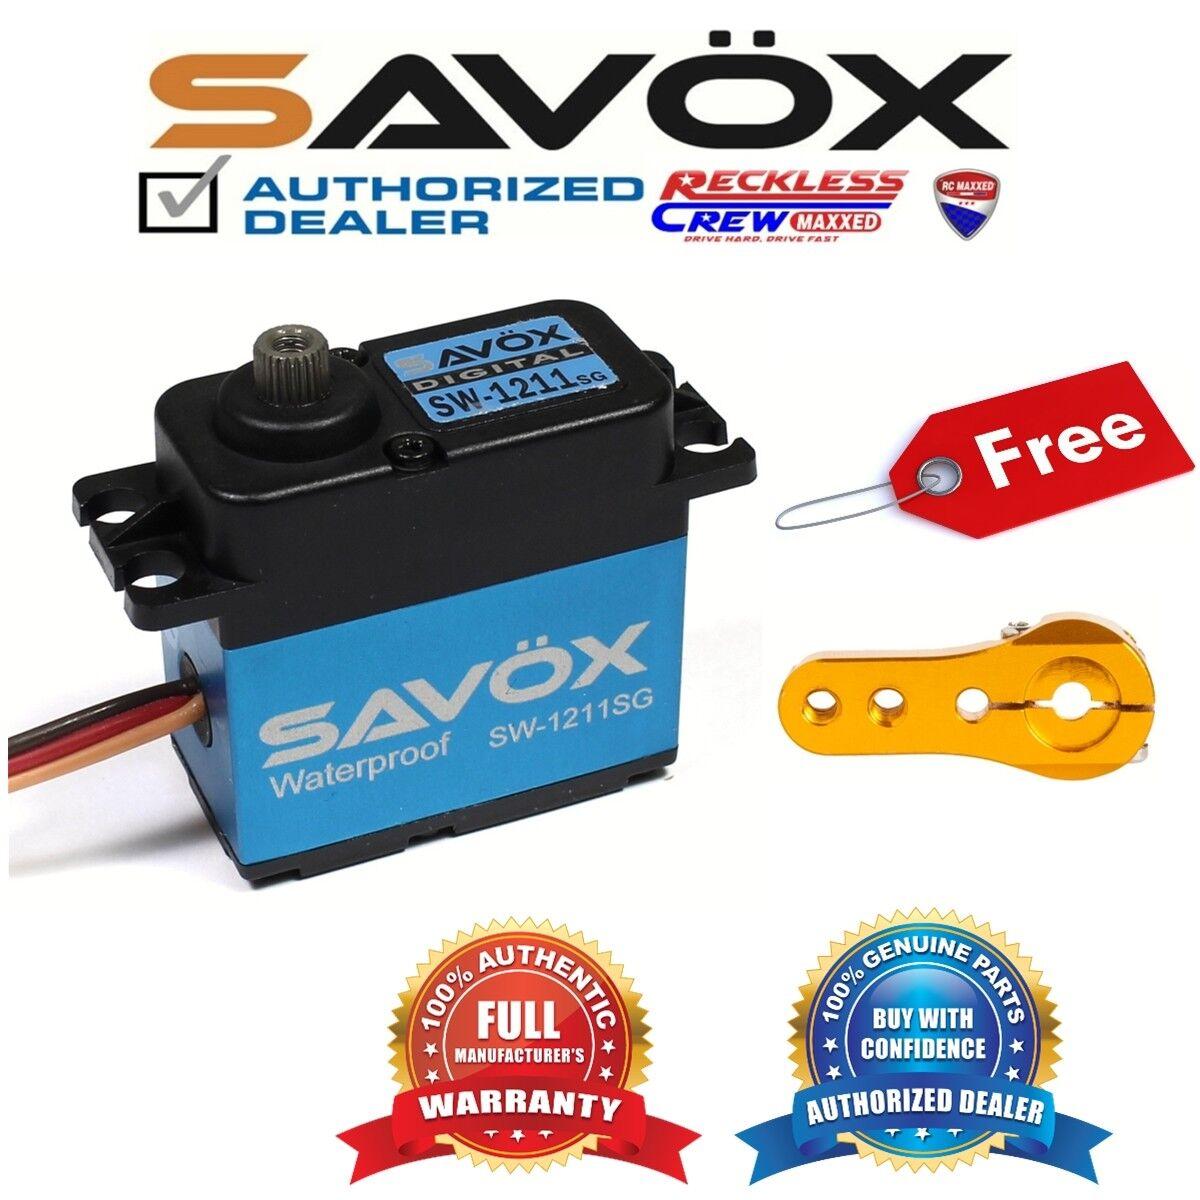 Savox SW-1211SG Waterproof HV Digital Servo + Free Aluminium servo horn oro